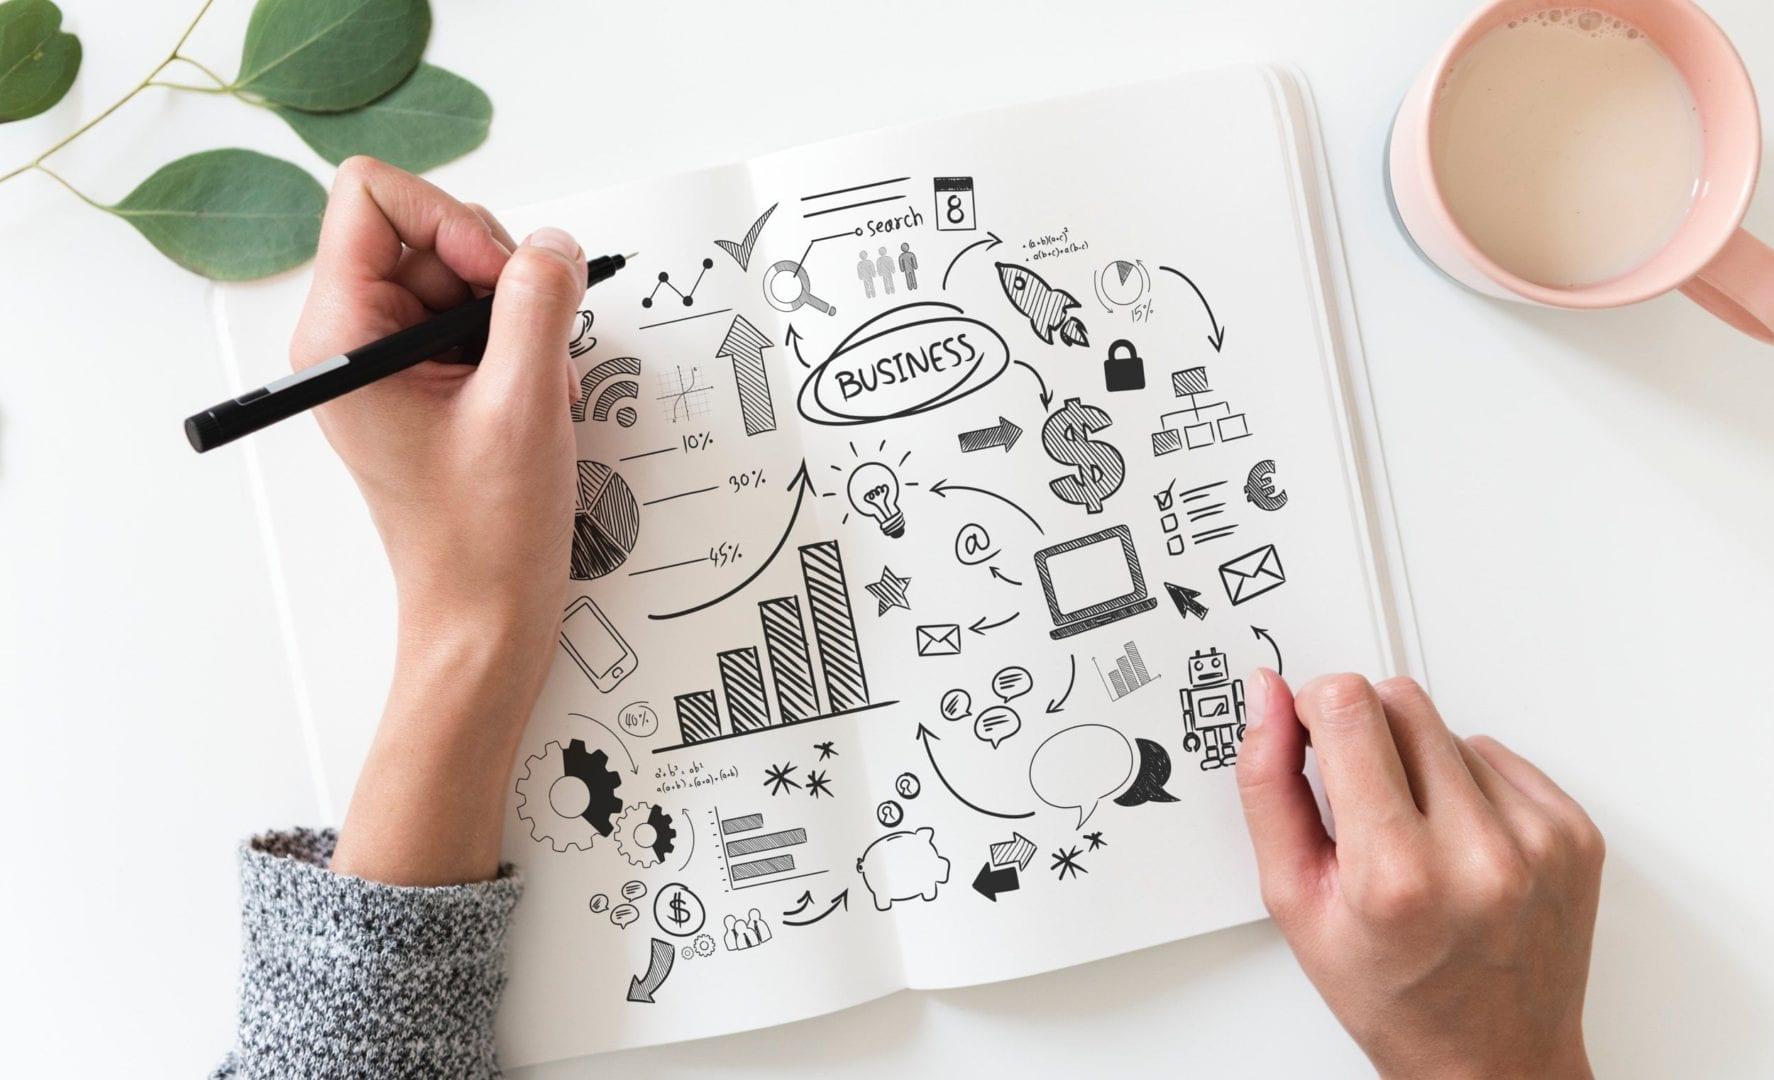 Tu plan de marketing en 6 pasos